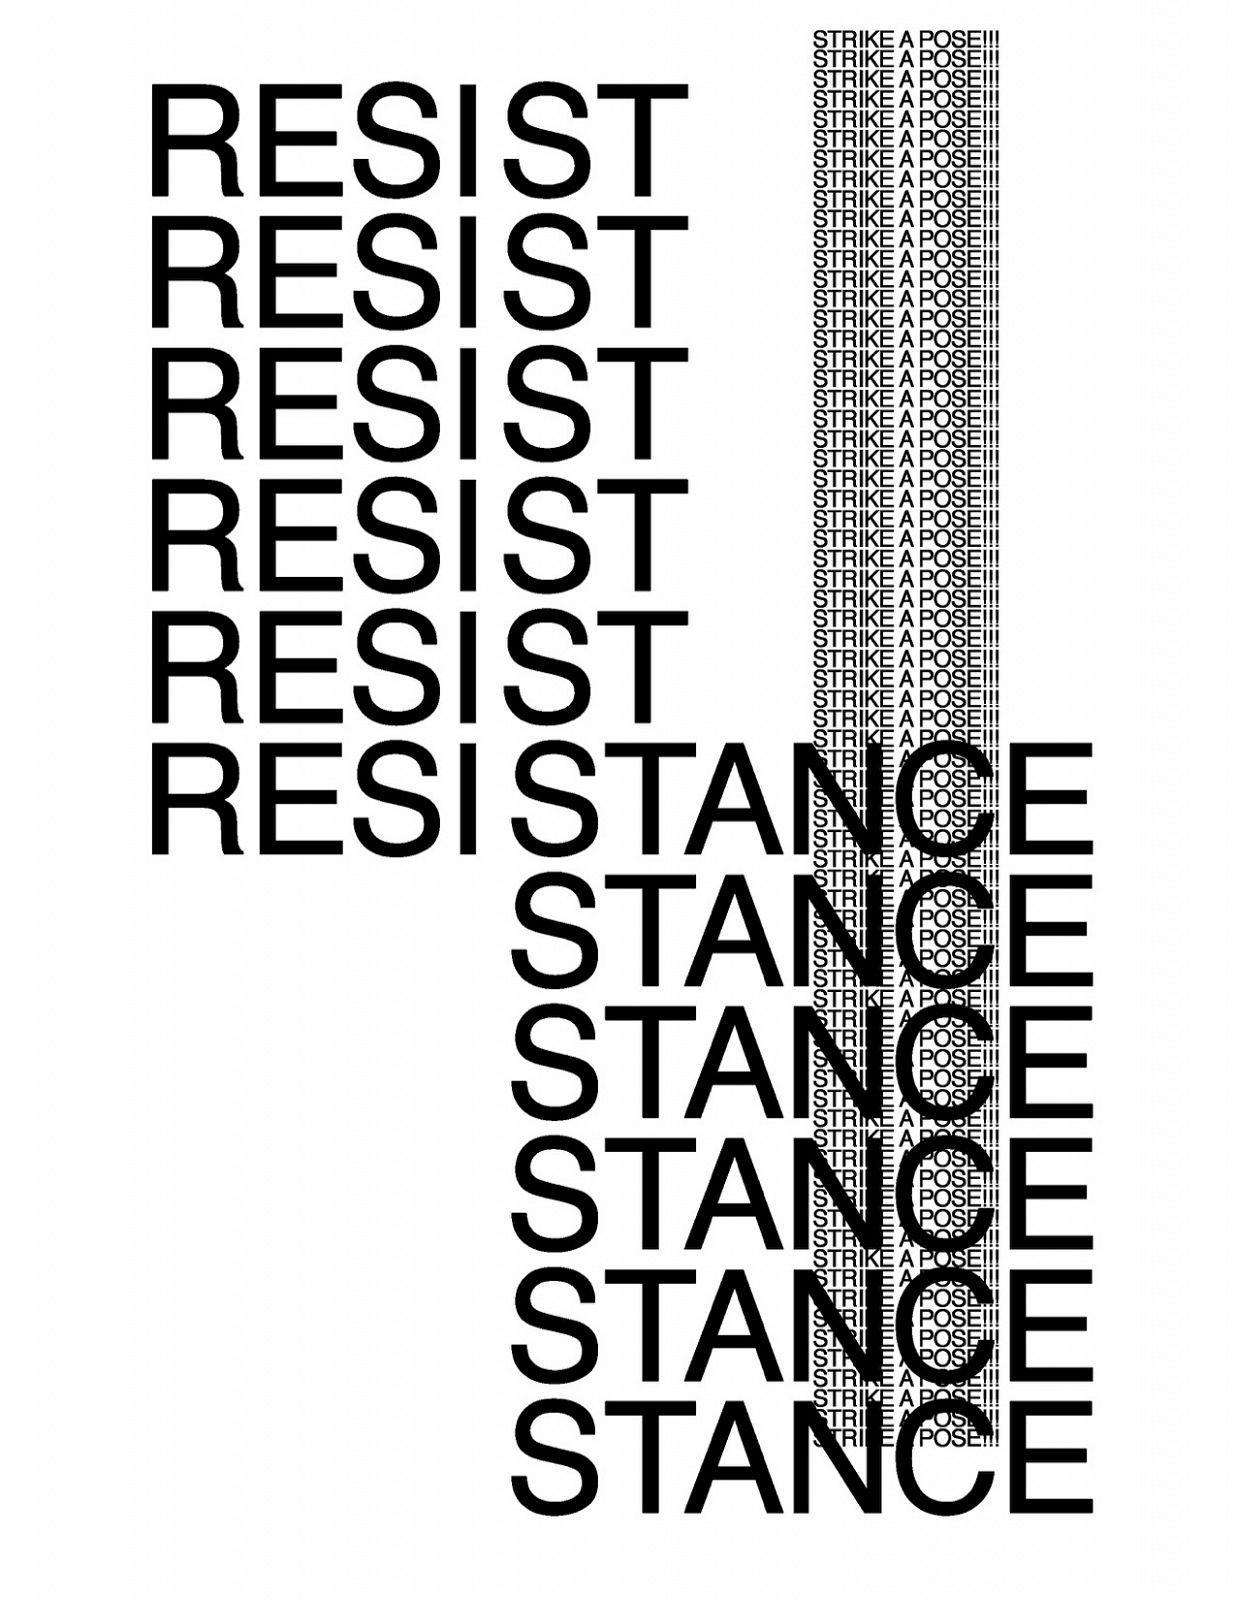 10resist stance.jpg